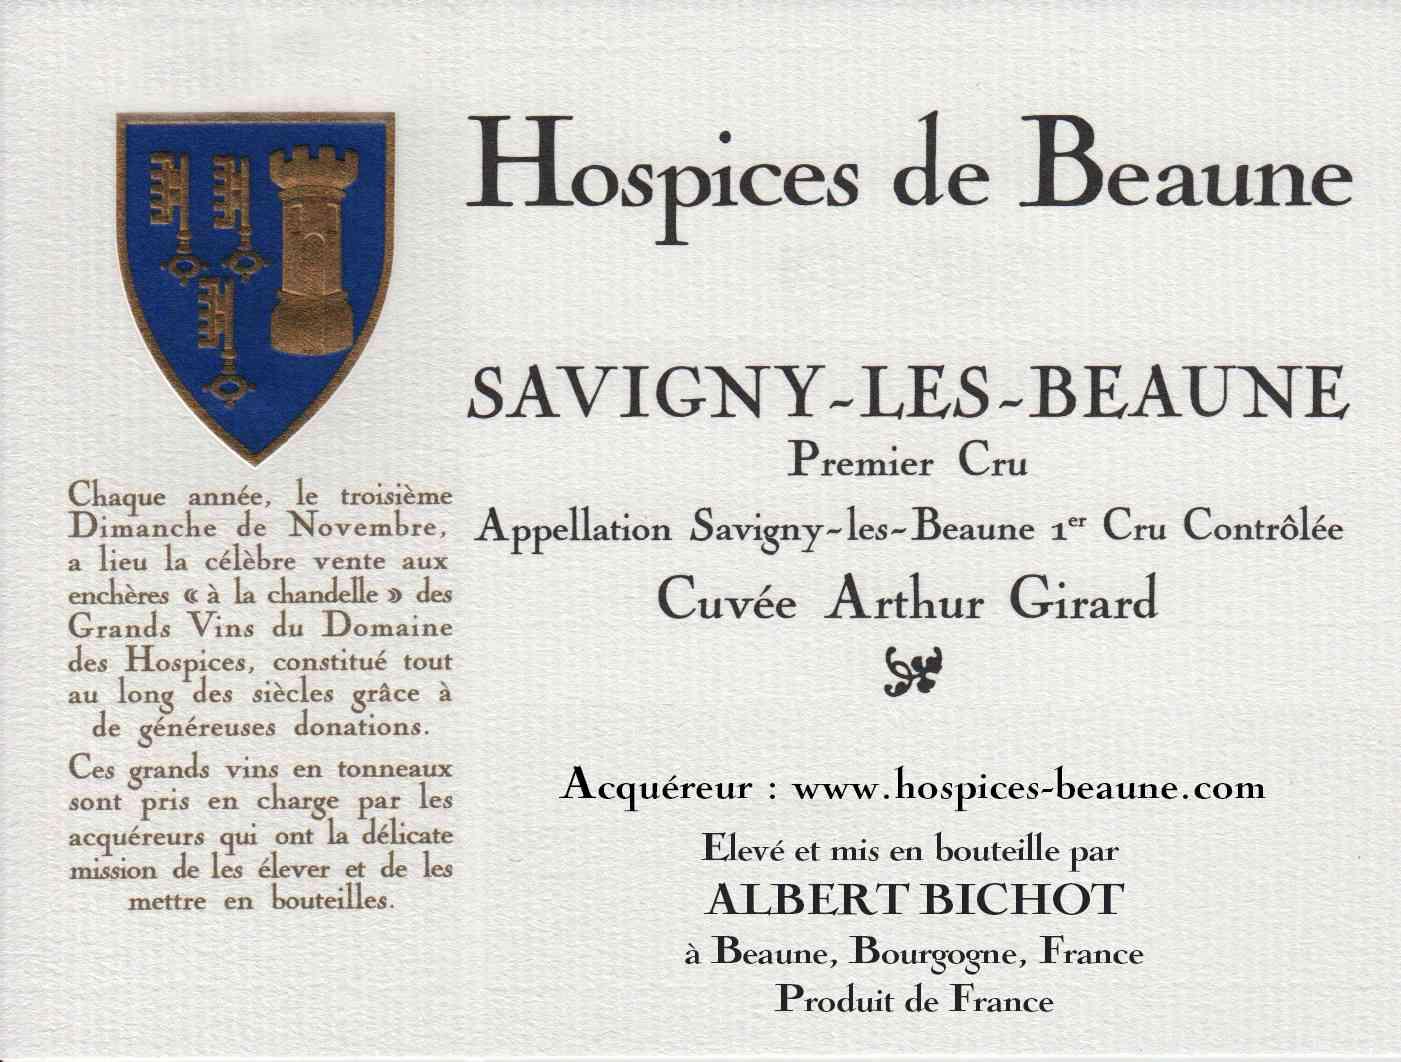 Encheres-auction-HospicesdeBeaune-AlbertBichot-SavignyLesBeaune-PremierCru-Cuvee-ArthurGirard